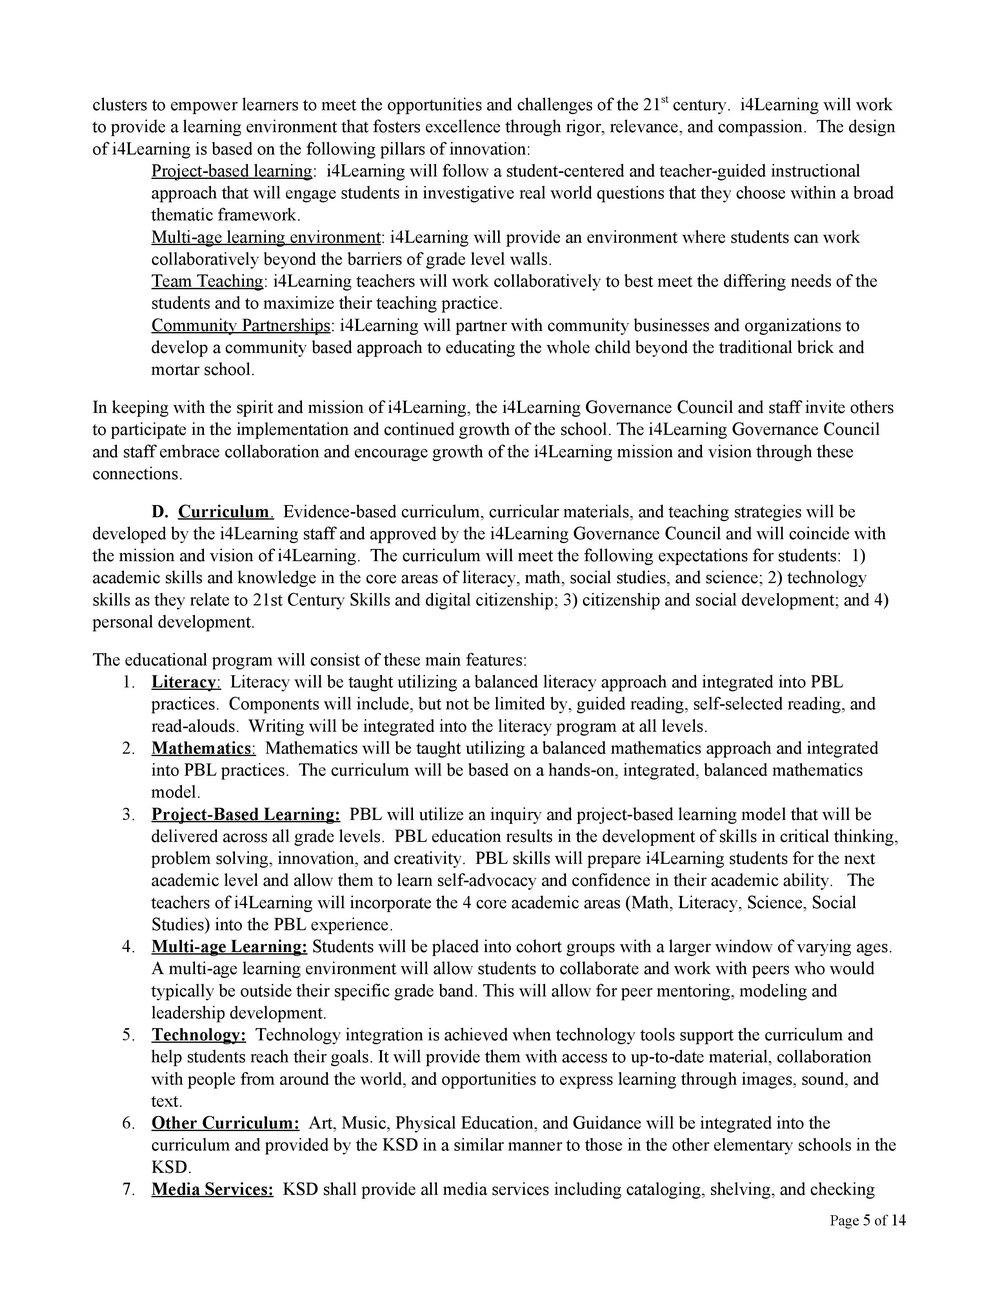 Contract pg 5.jpg